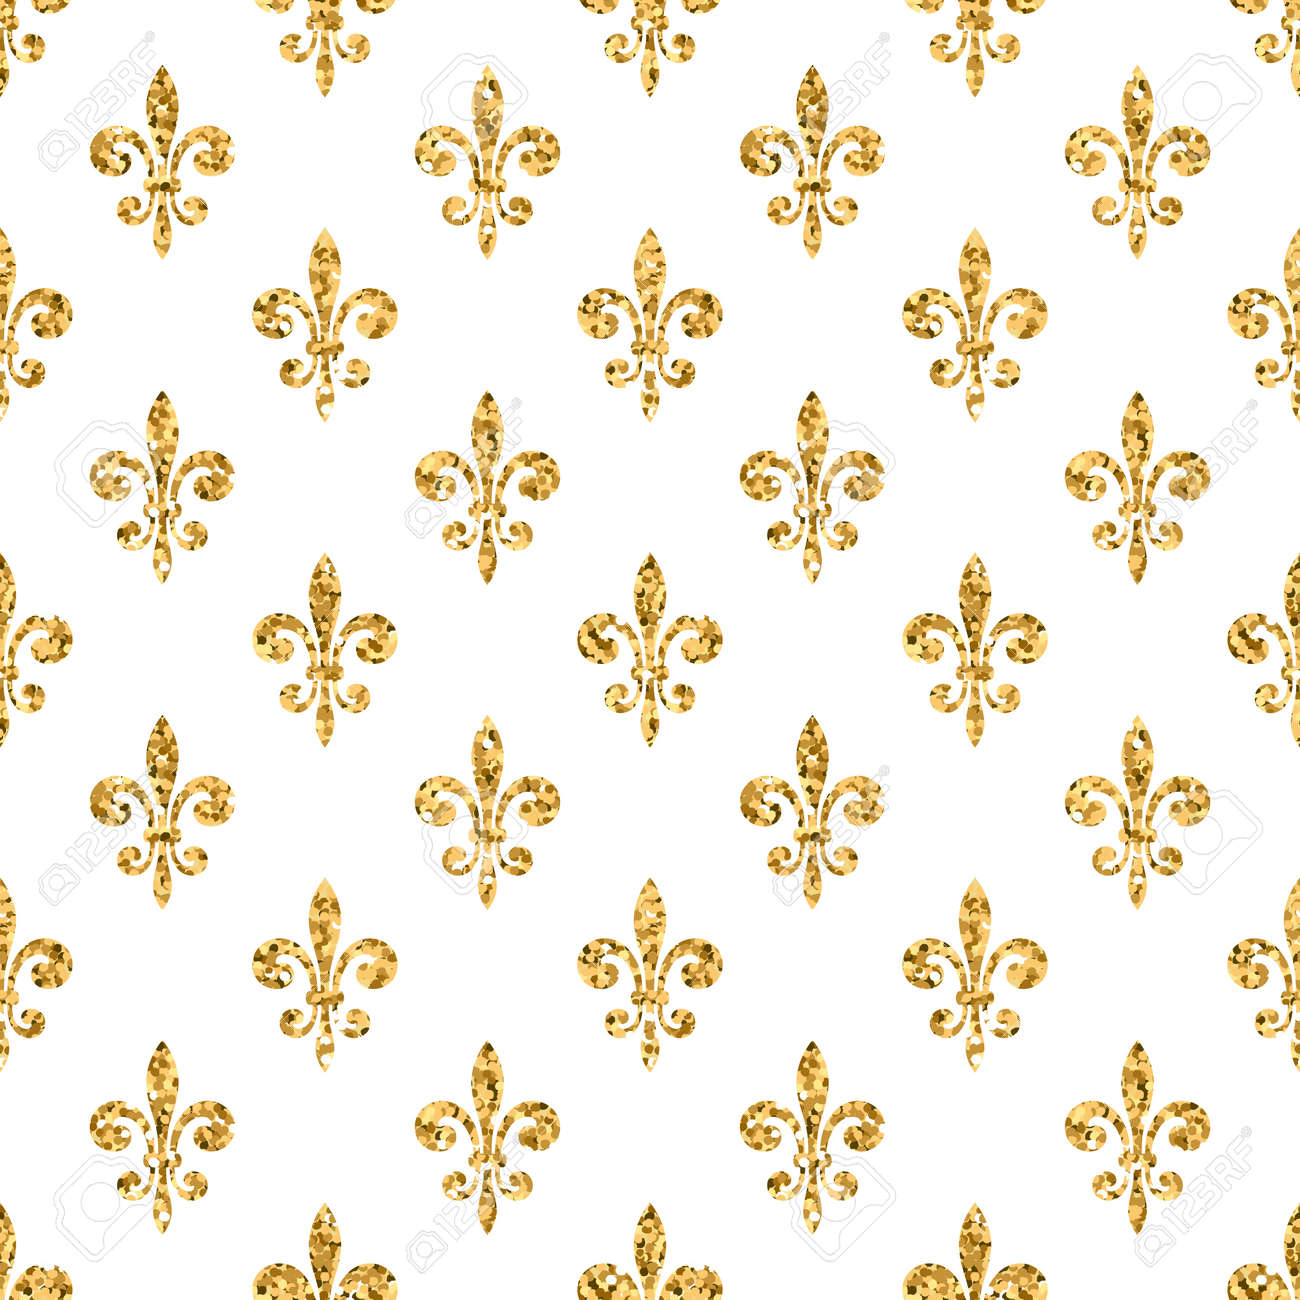 Golden Fleur De Lis Seamless Pattern Gold Glitter And White Template Floral